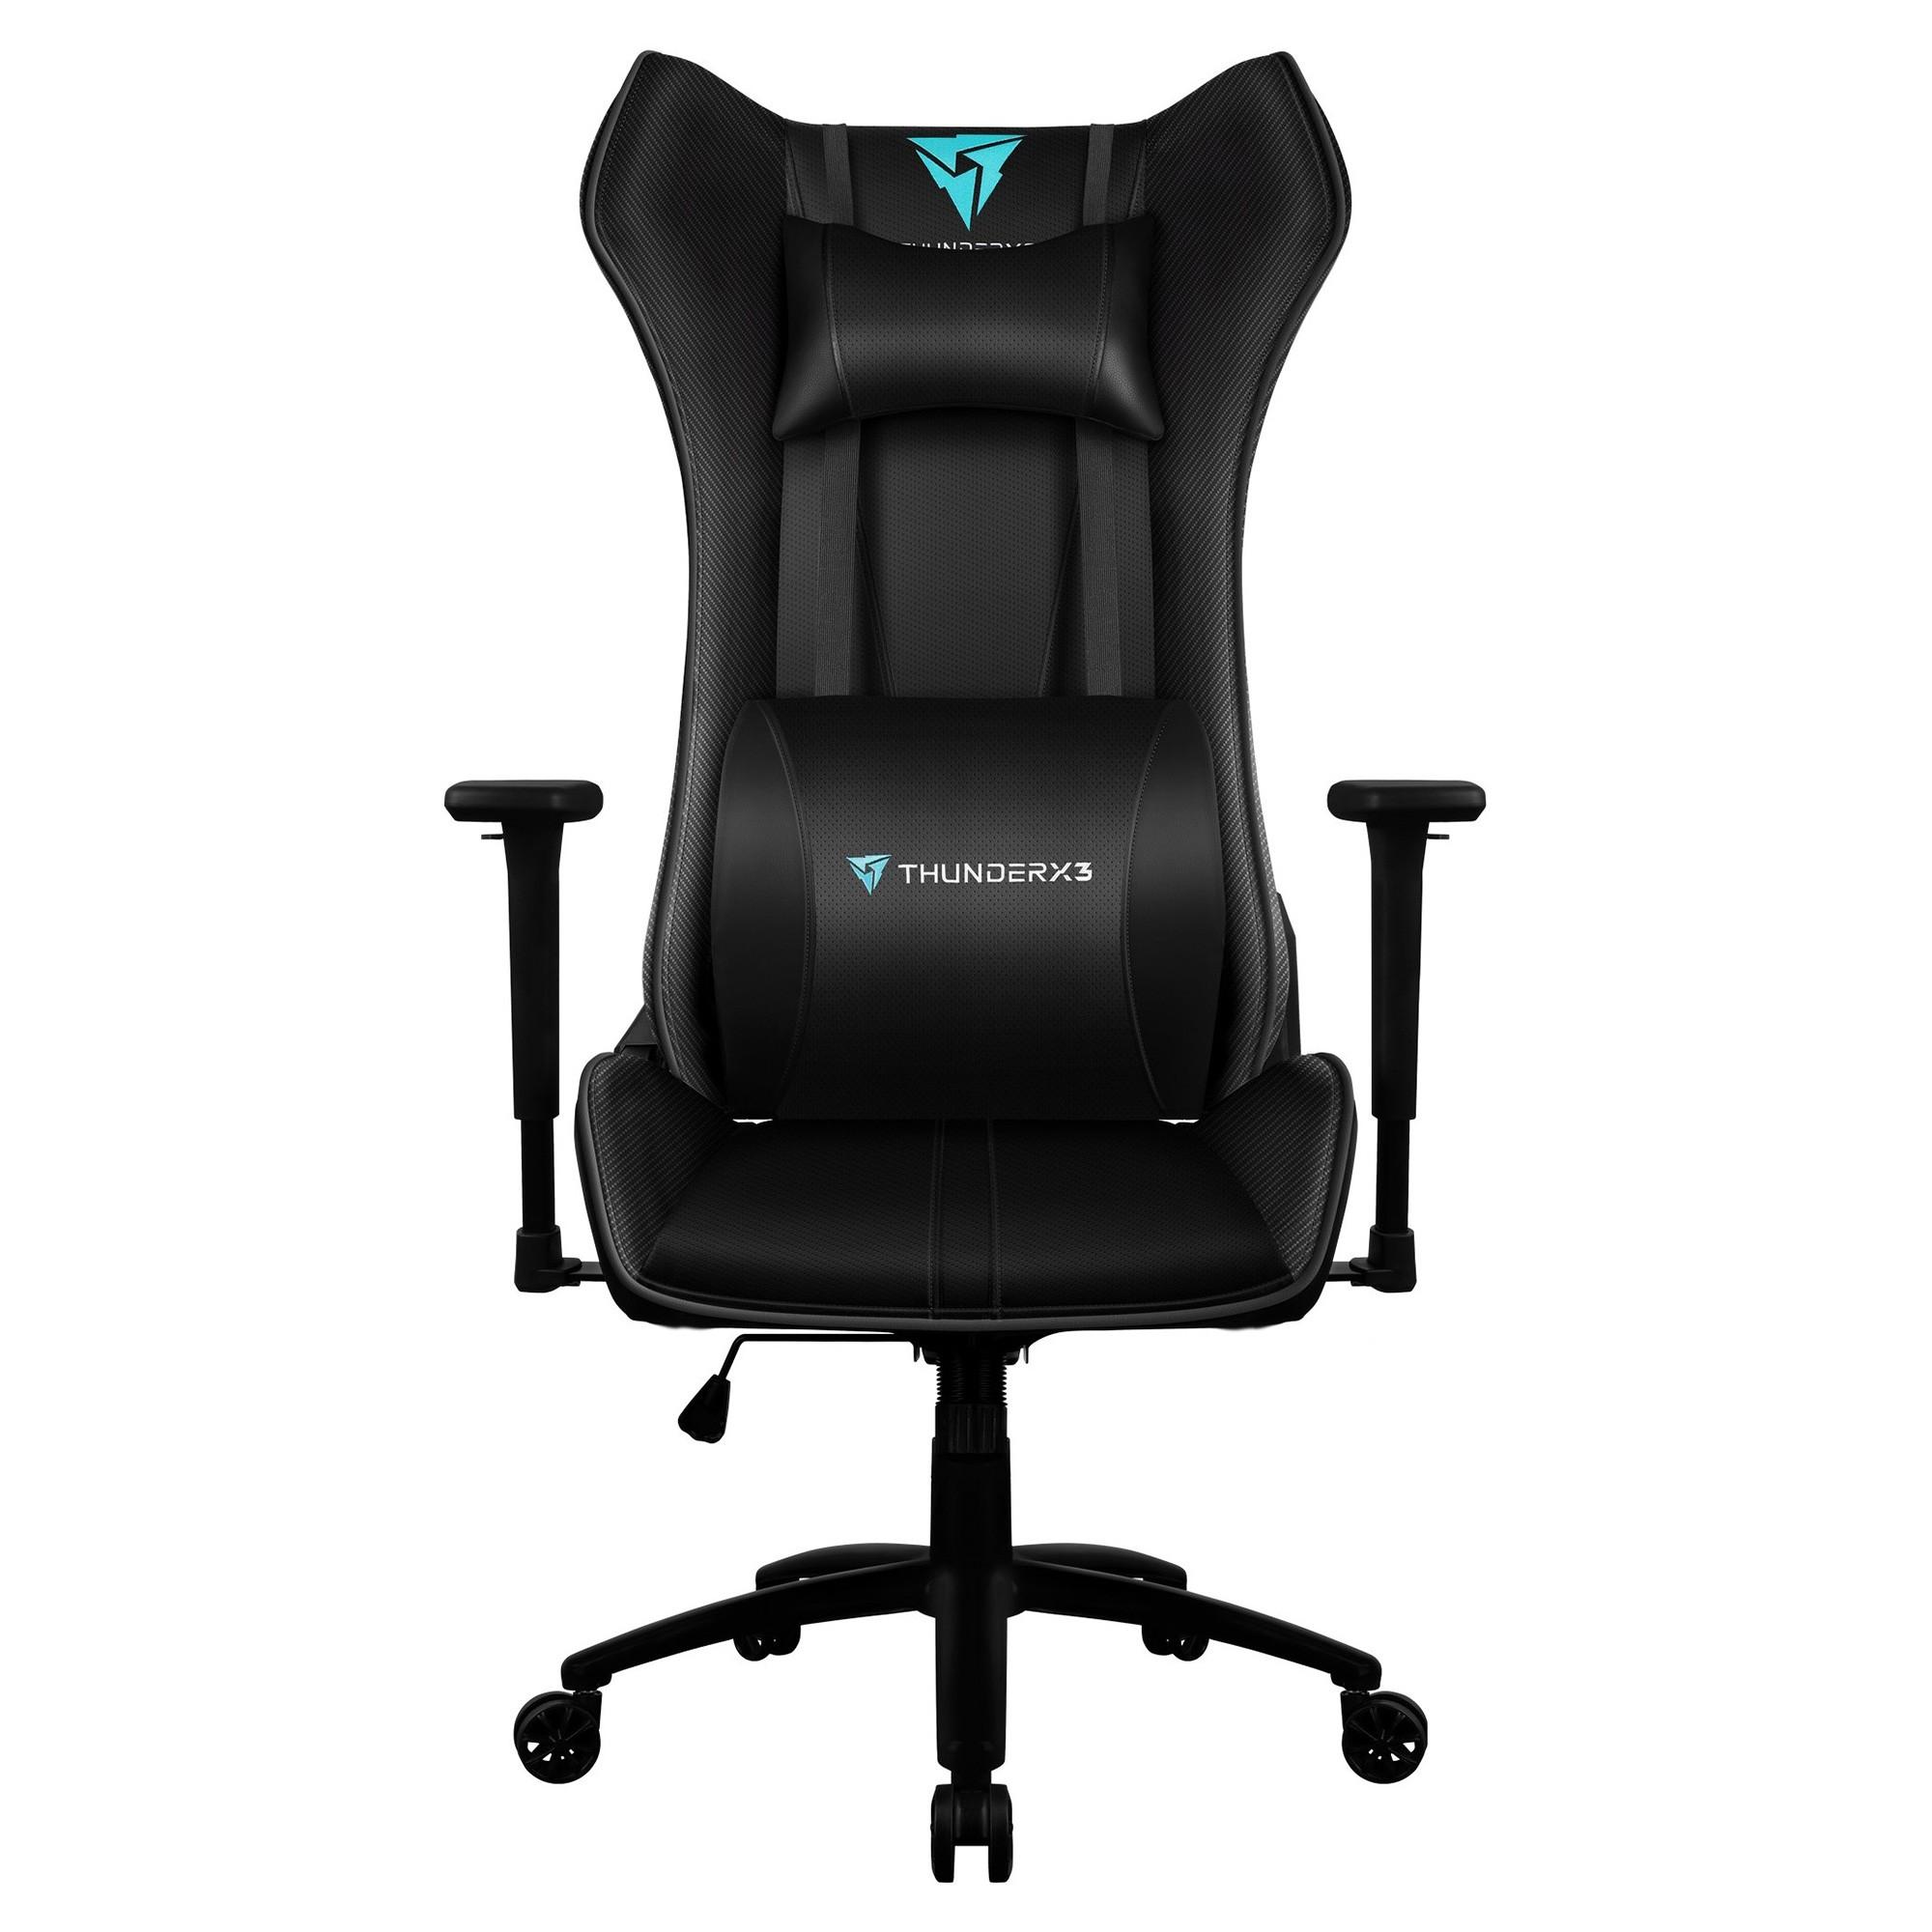 ThunderX3 UC5 Gaming Chair, Black